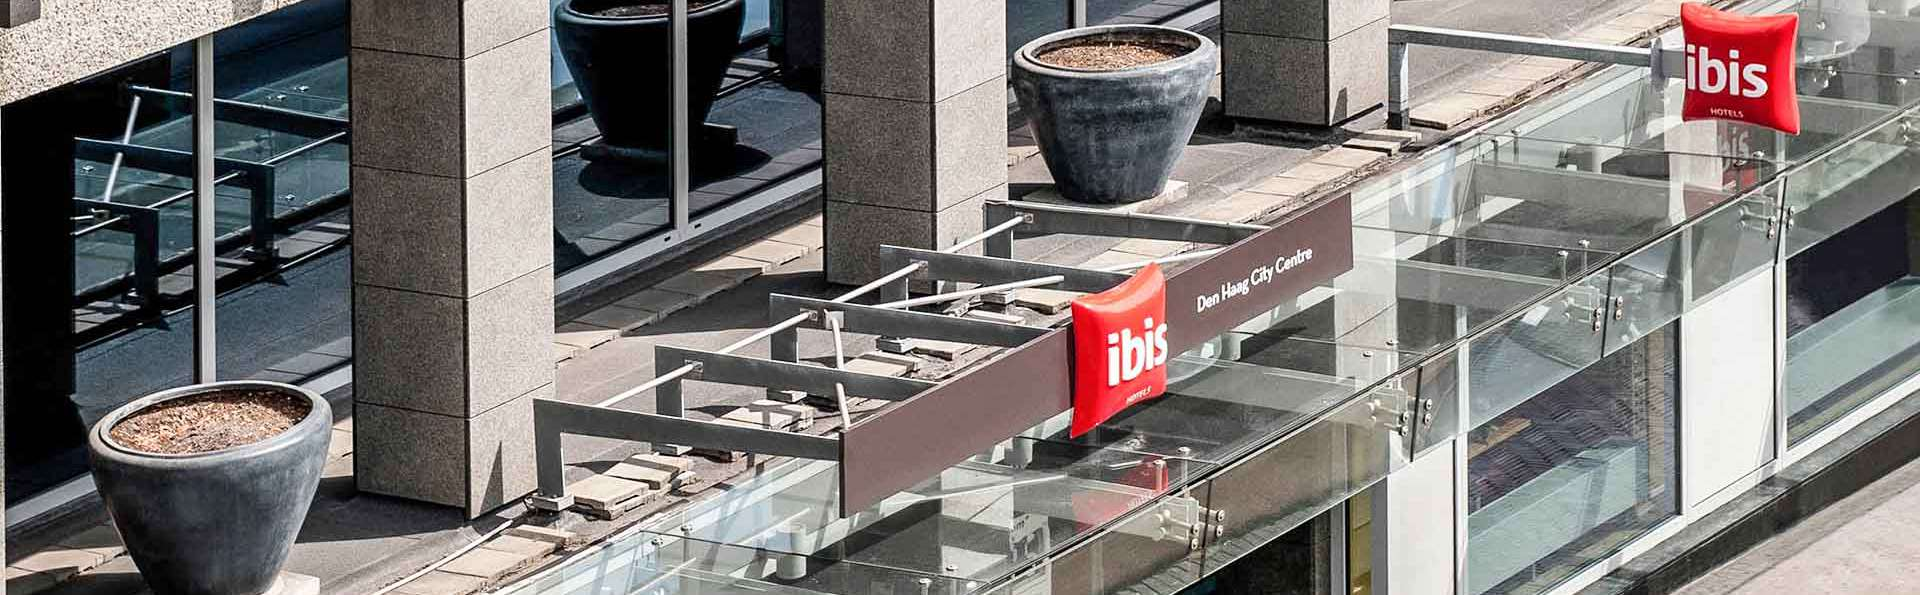 Ibis Den Haag City Centre - EDIT_ibis_hotel_den_haag_02.jpg